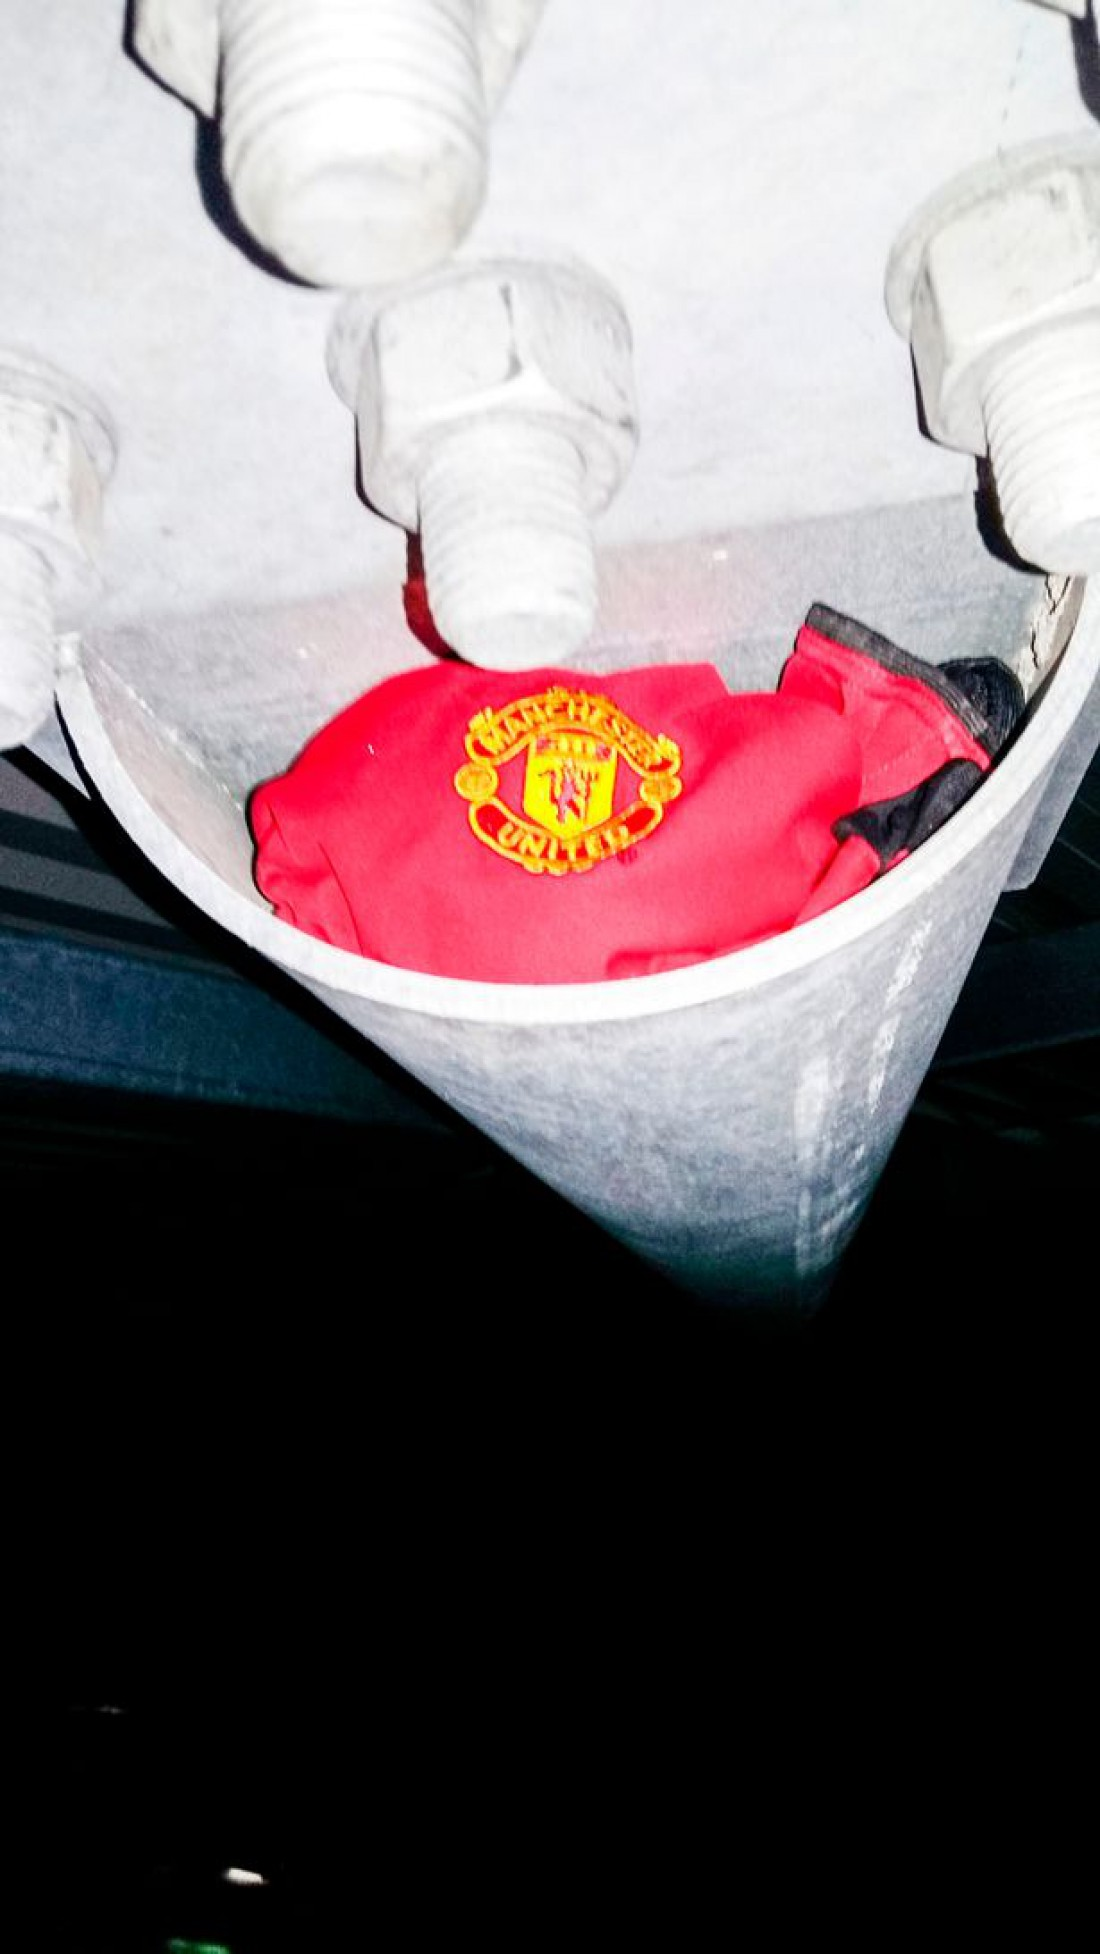 Футболка МЮ на крыше Энфилд Роад